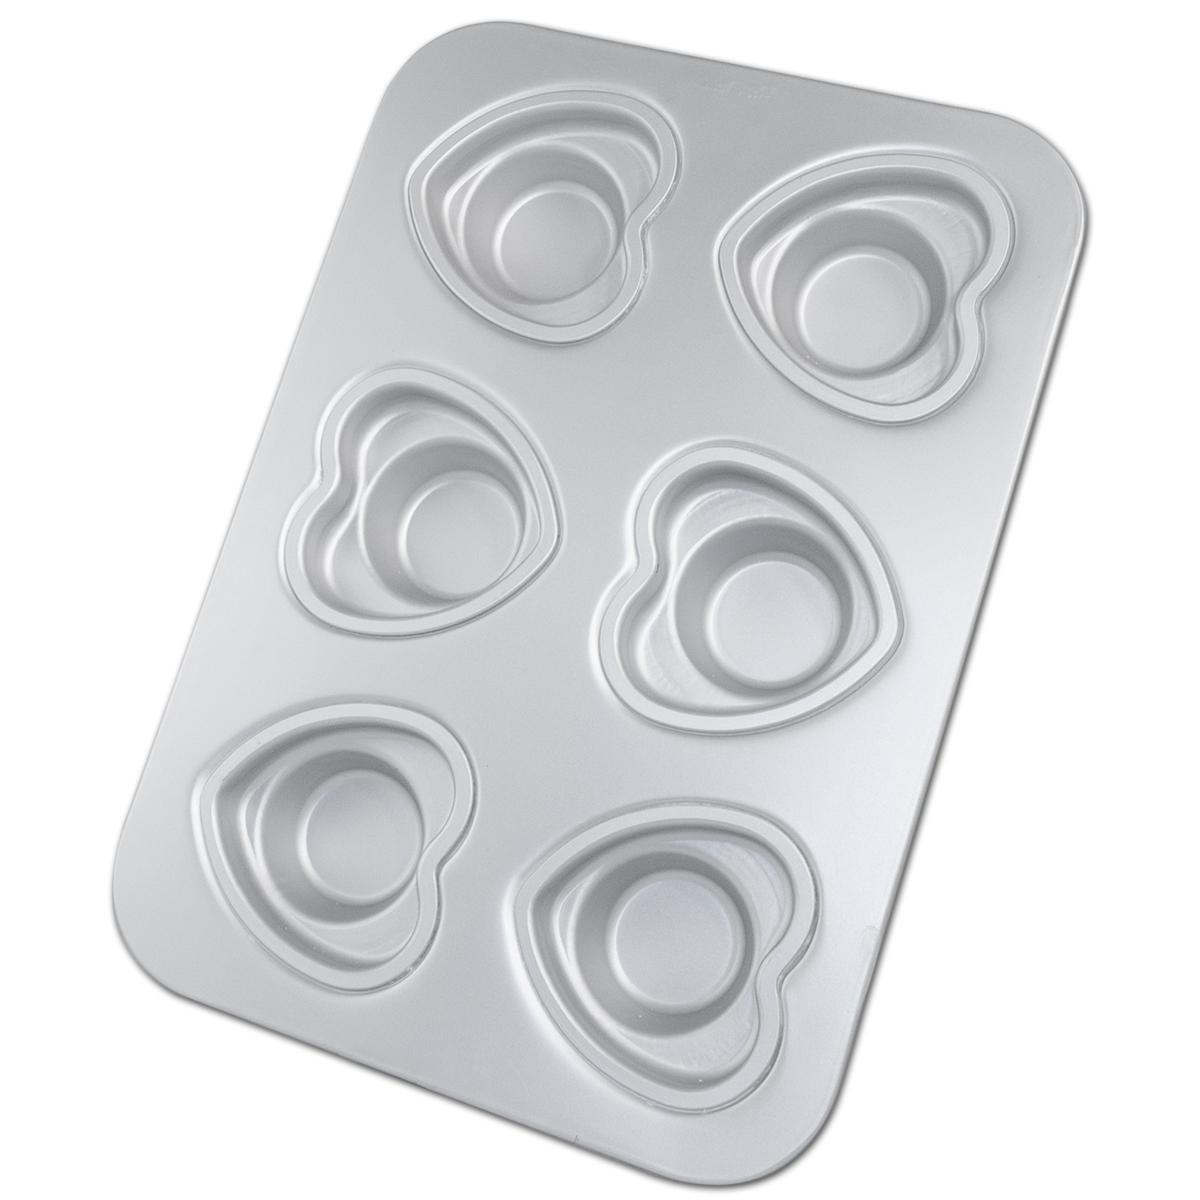 "Fat Daddio's Crown Muffin Pan 12 cup Heart Shape 3 3/4"" OD 2 1/8"" (Single)"